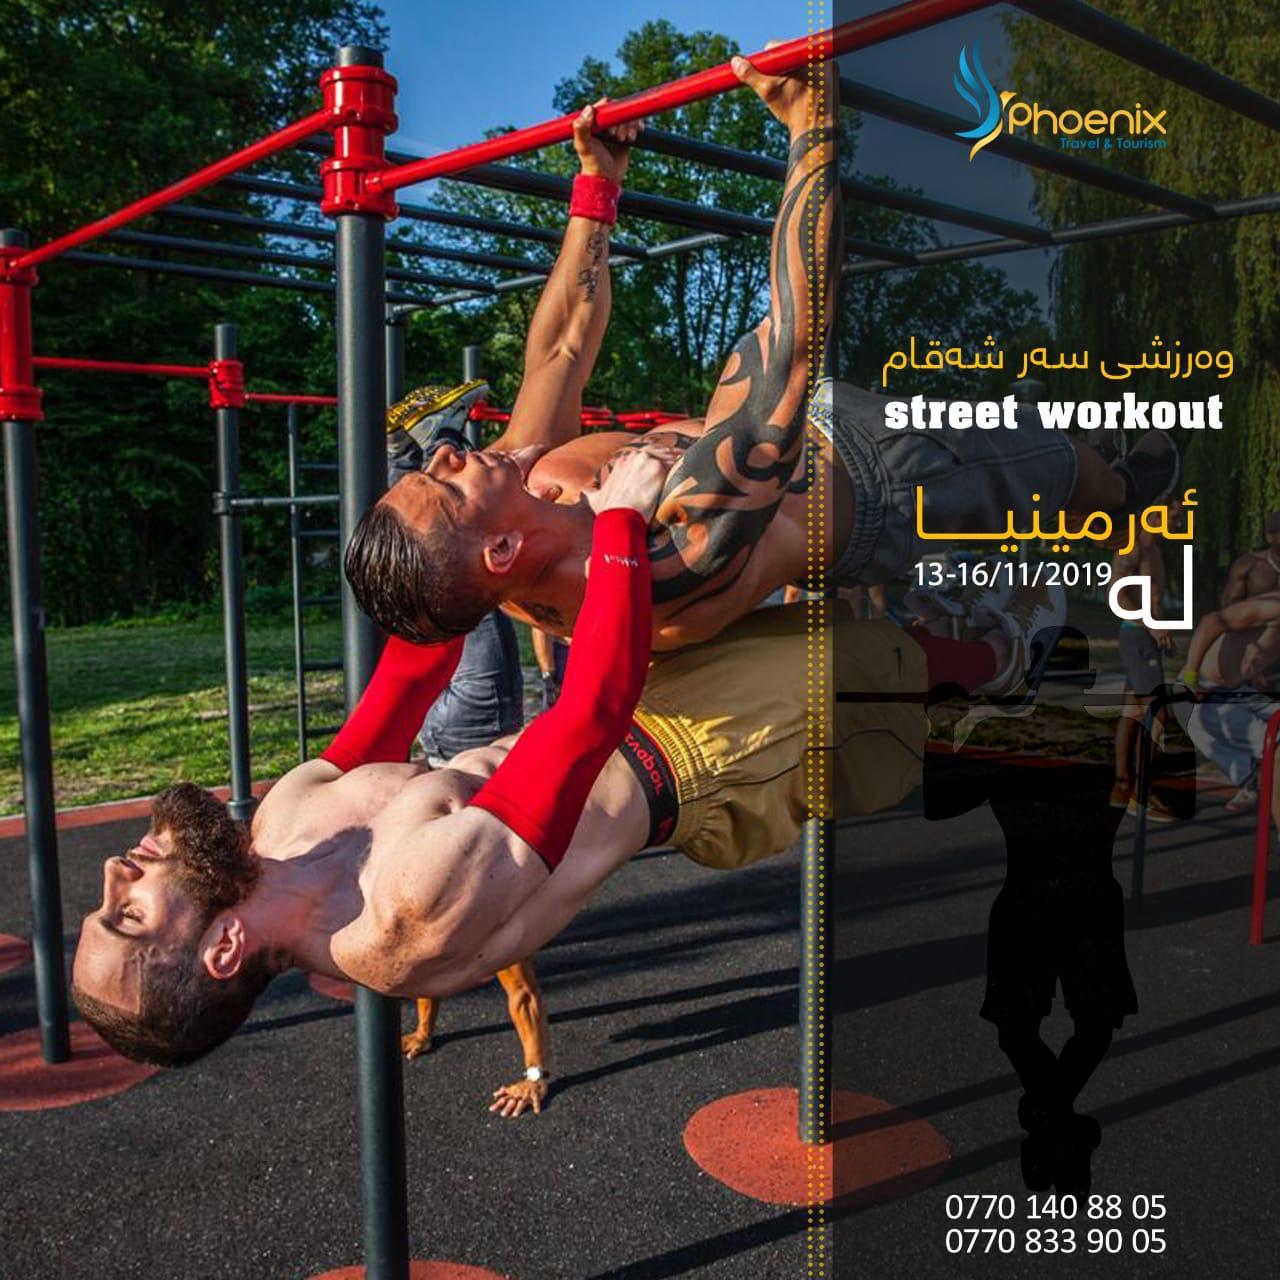 Street workouts